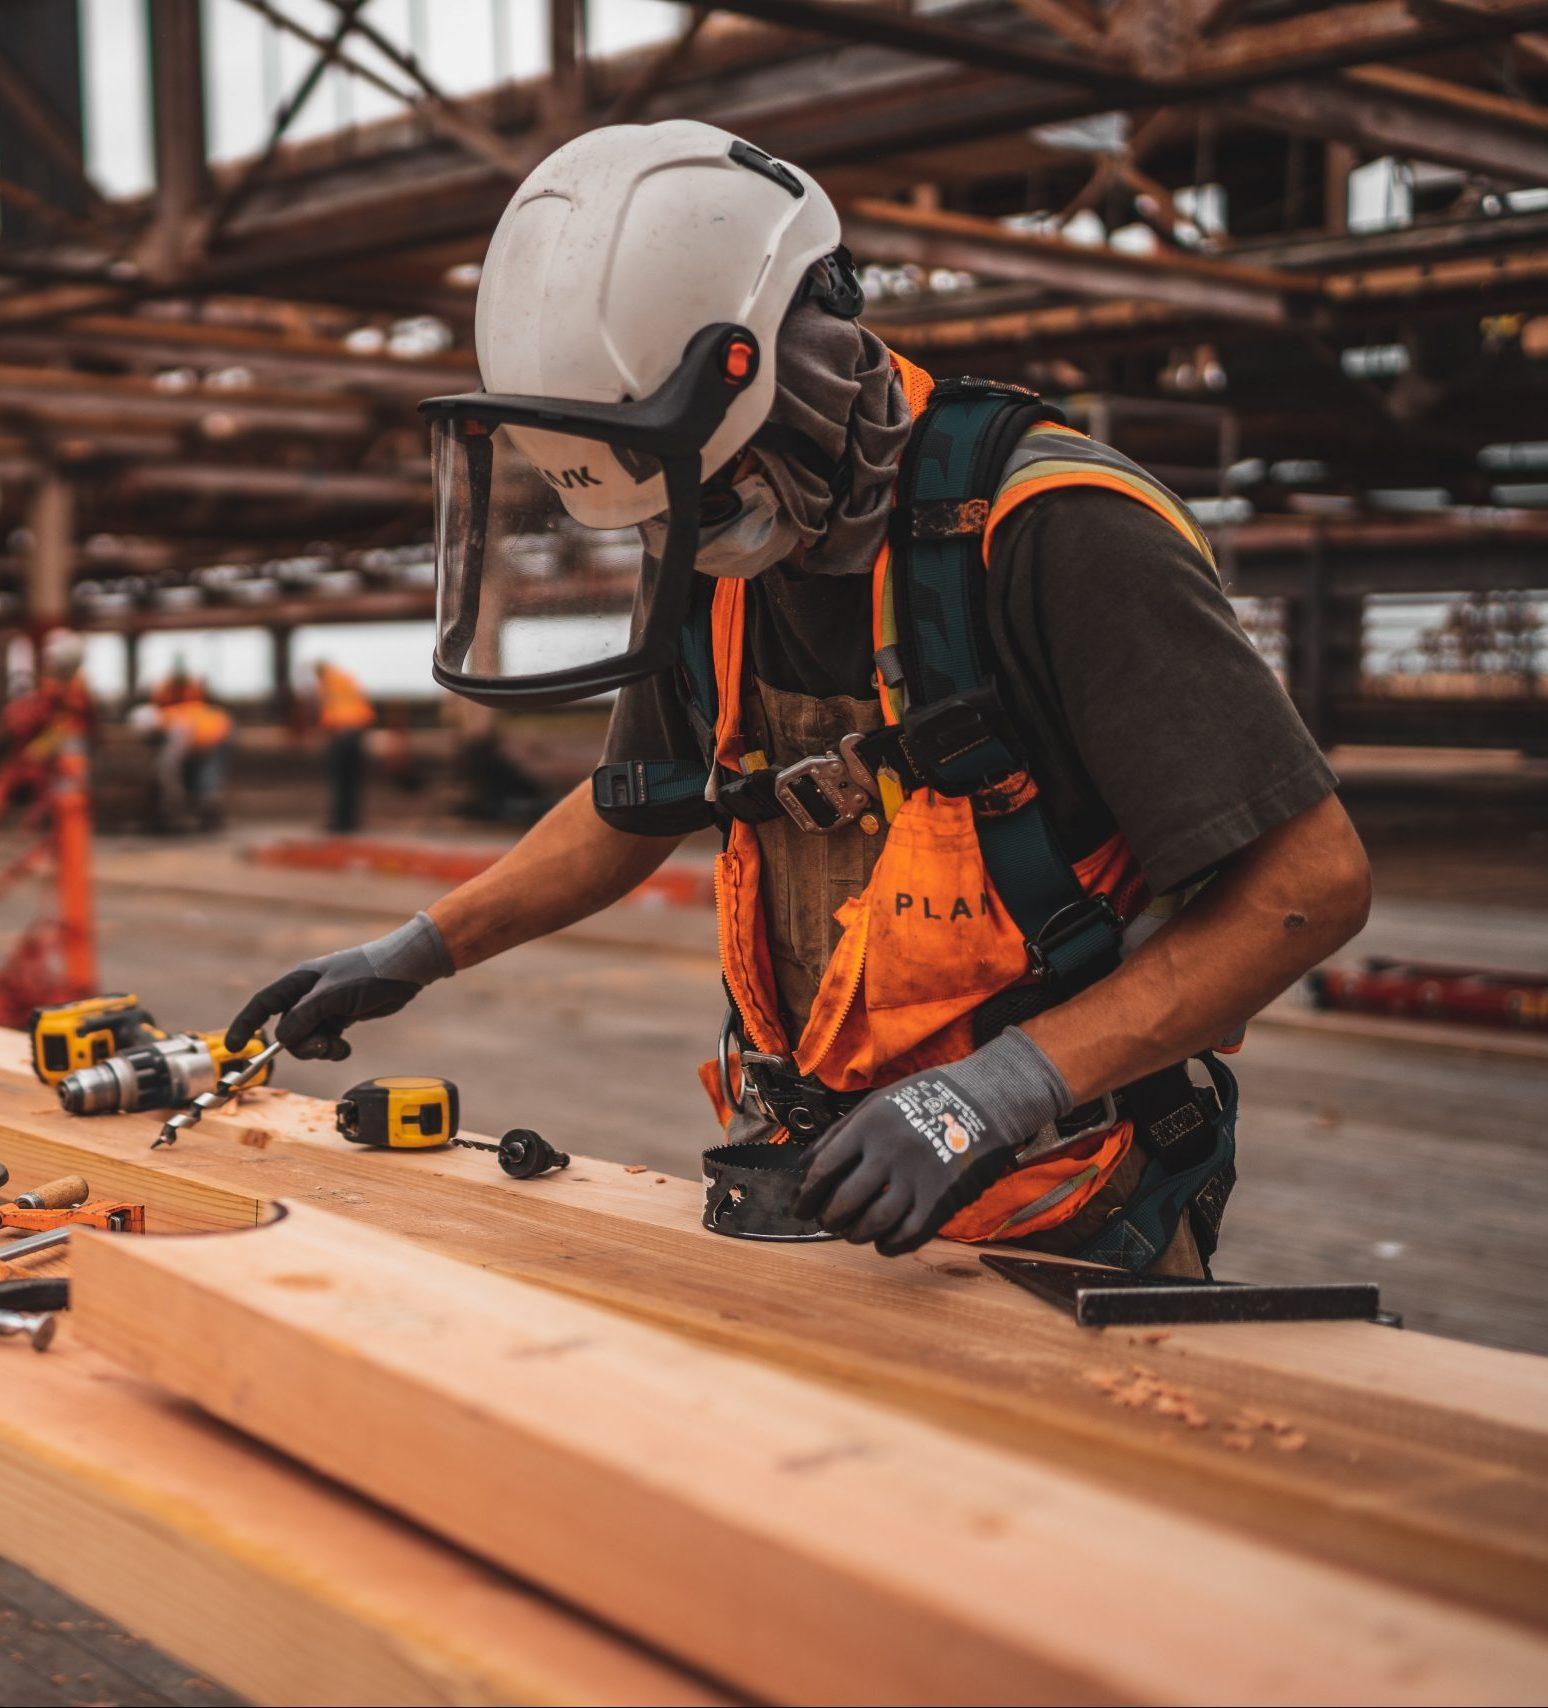 traineeship program in Building & Construction